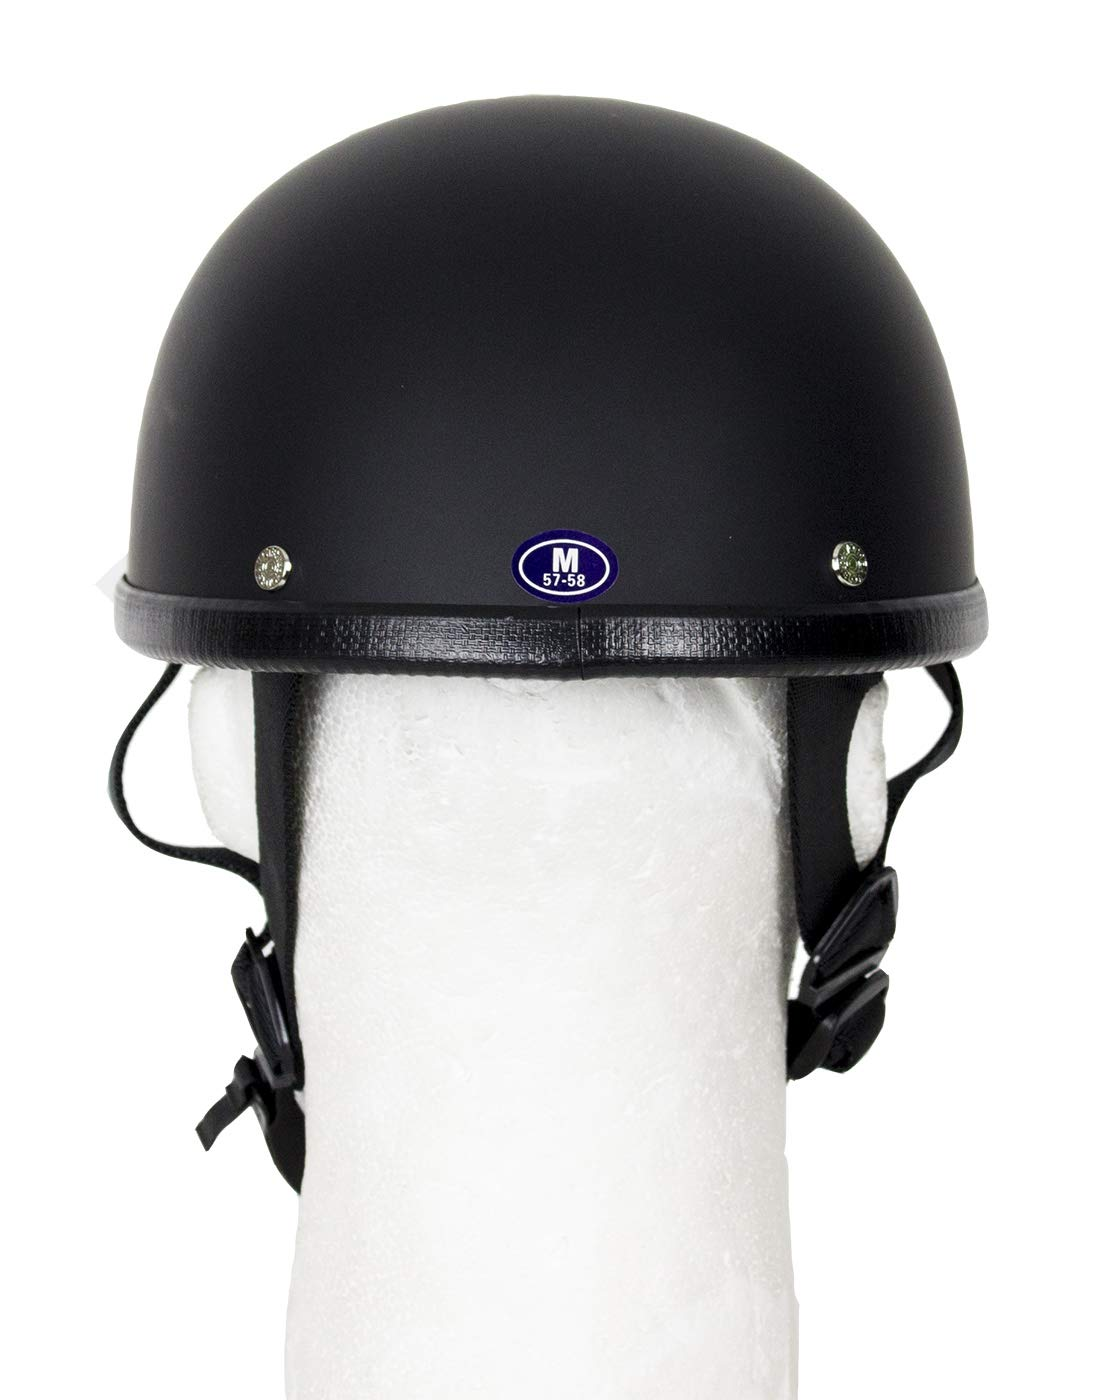 DMD Trading Low Profile Motorcycle Skull Cap Eagle Novelty Matte Flat Helmet W//Adjustable Chin Strap